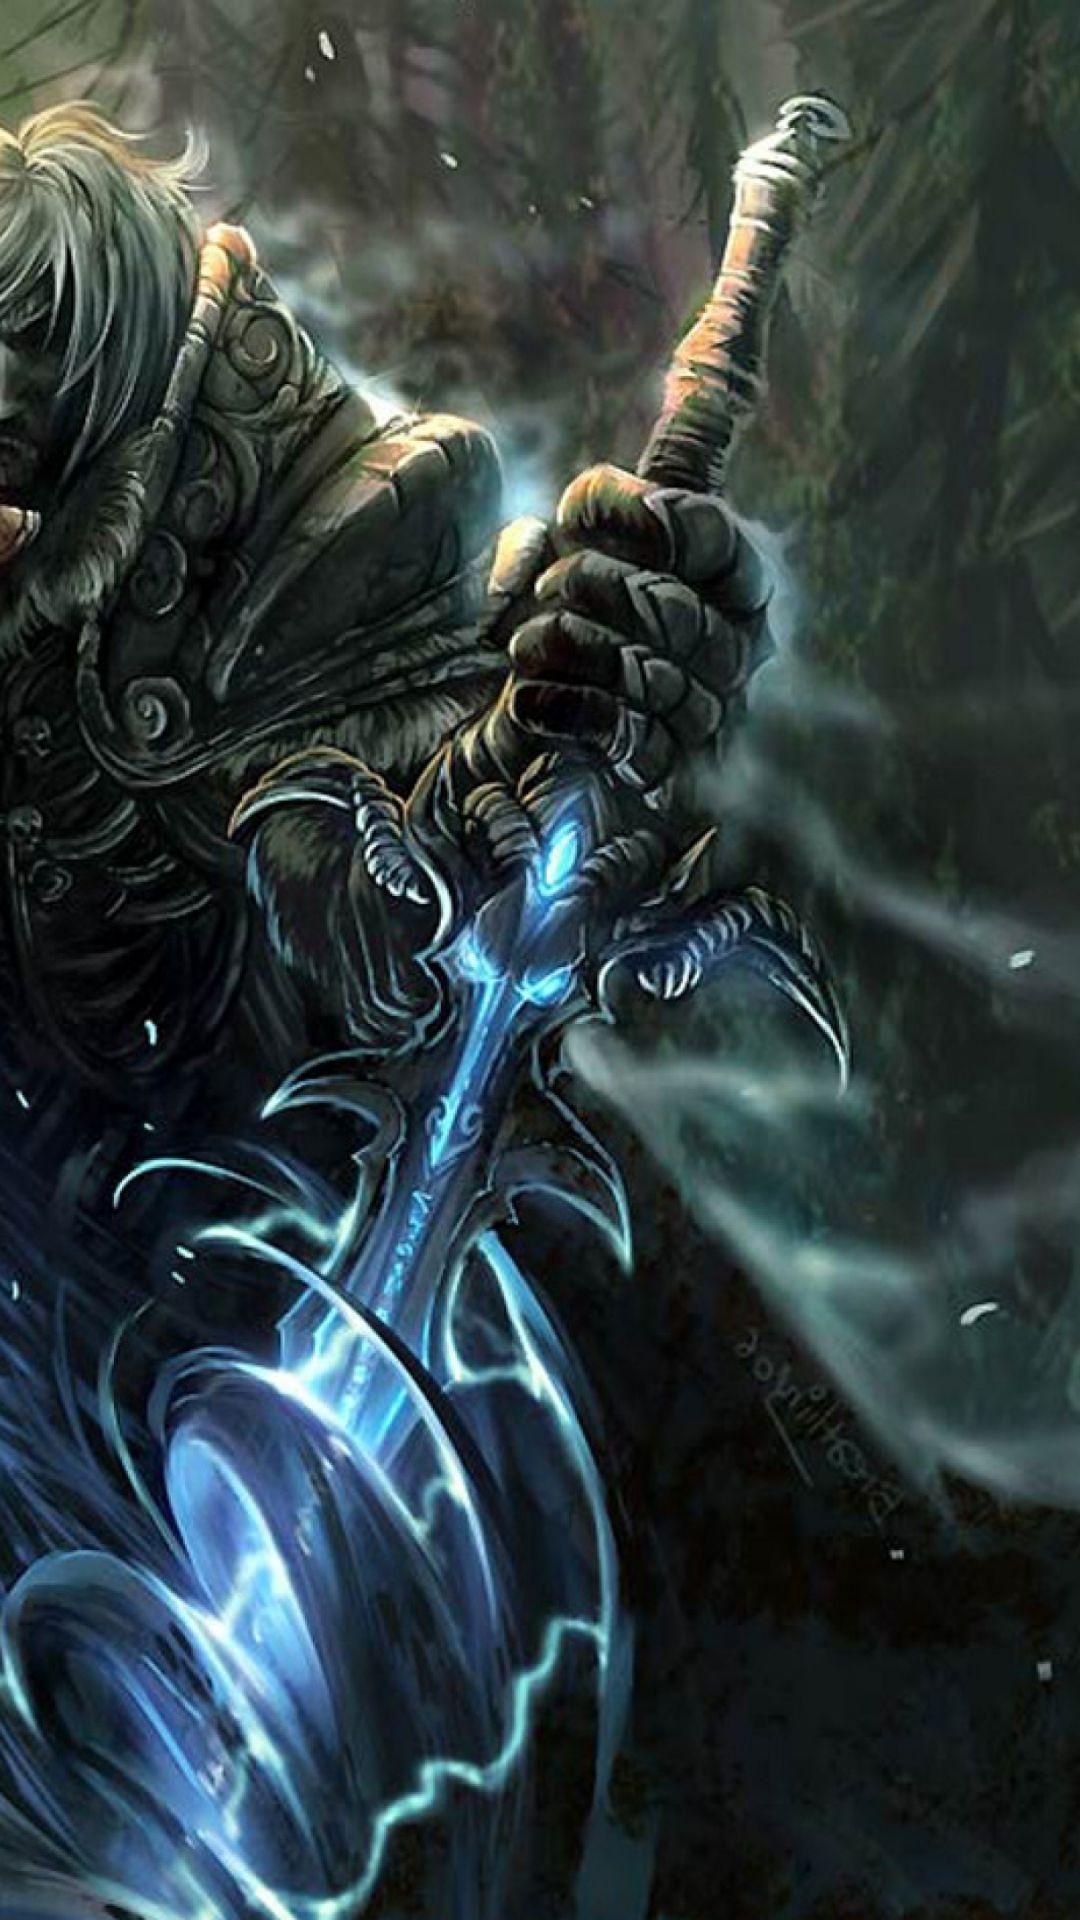 Free World Of Warcraft Wallpaper K For Smartphone